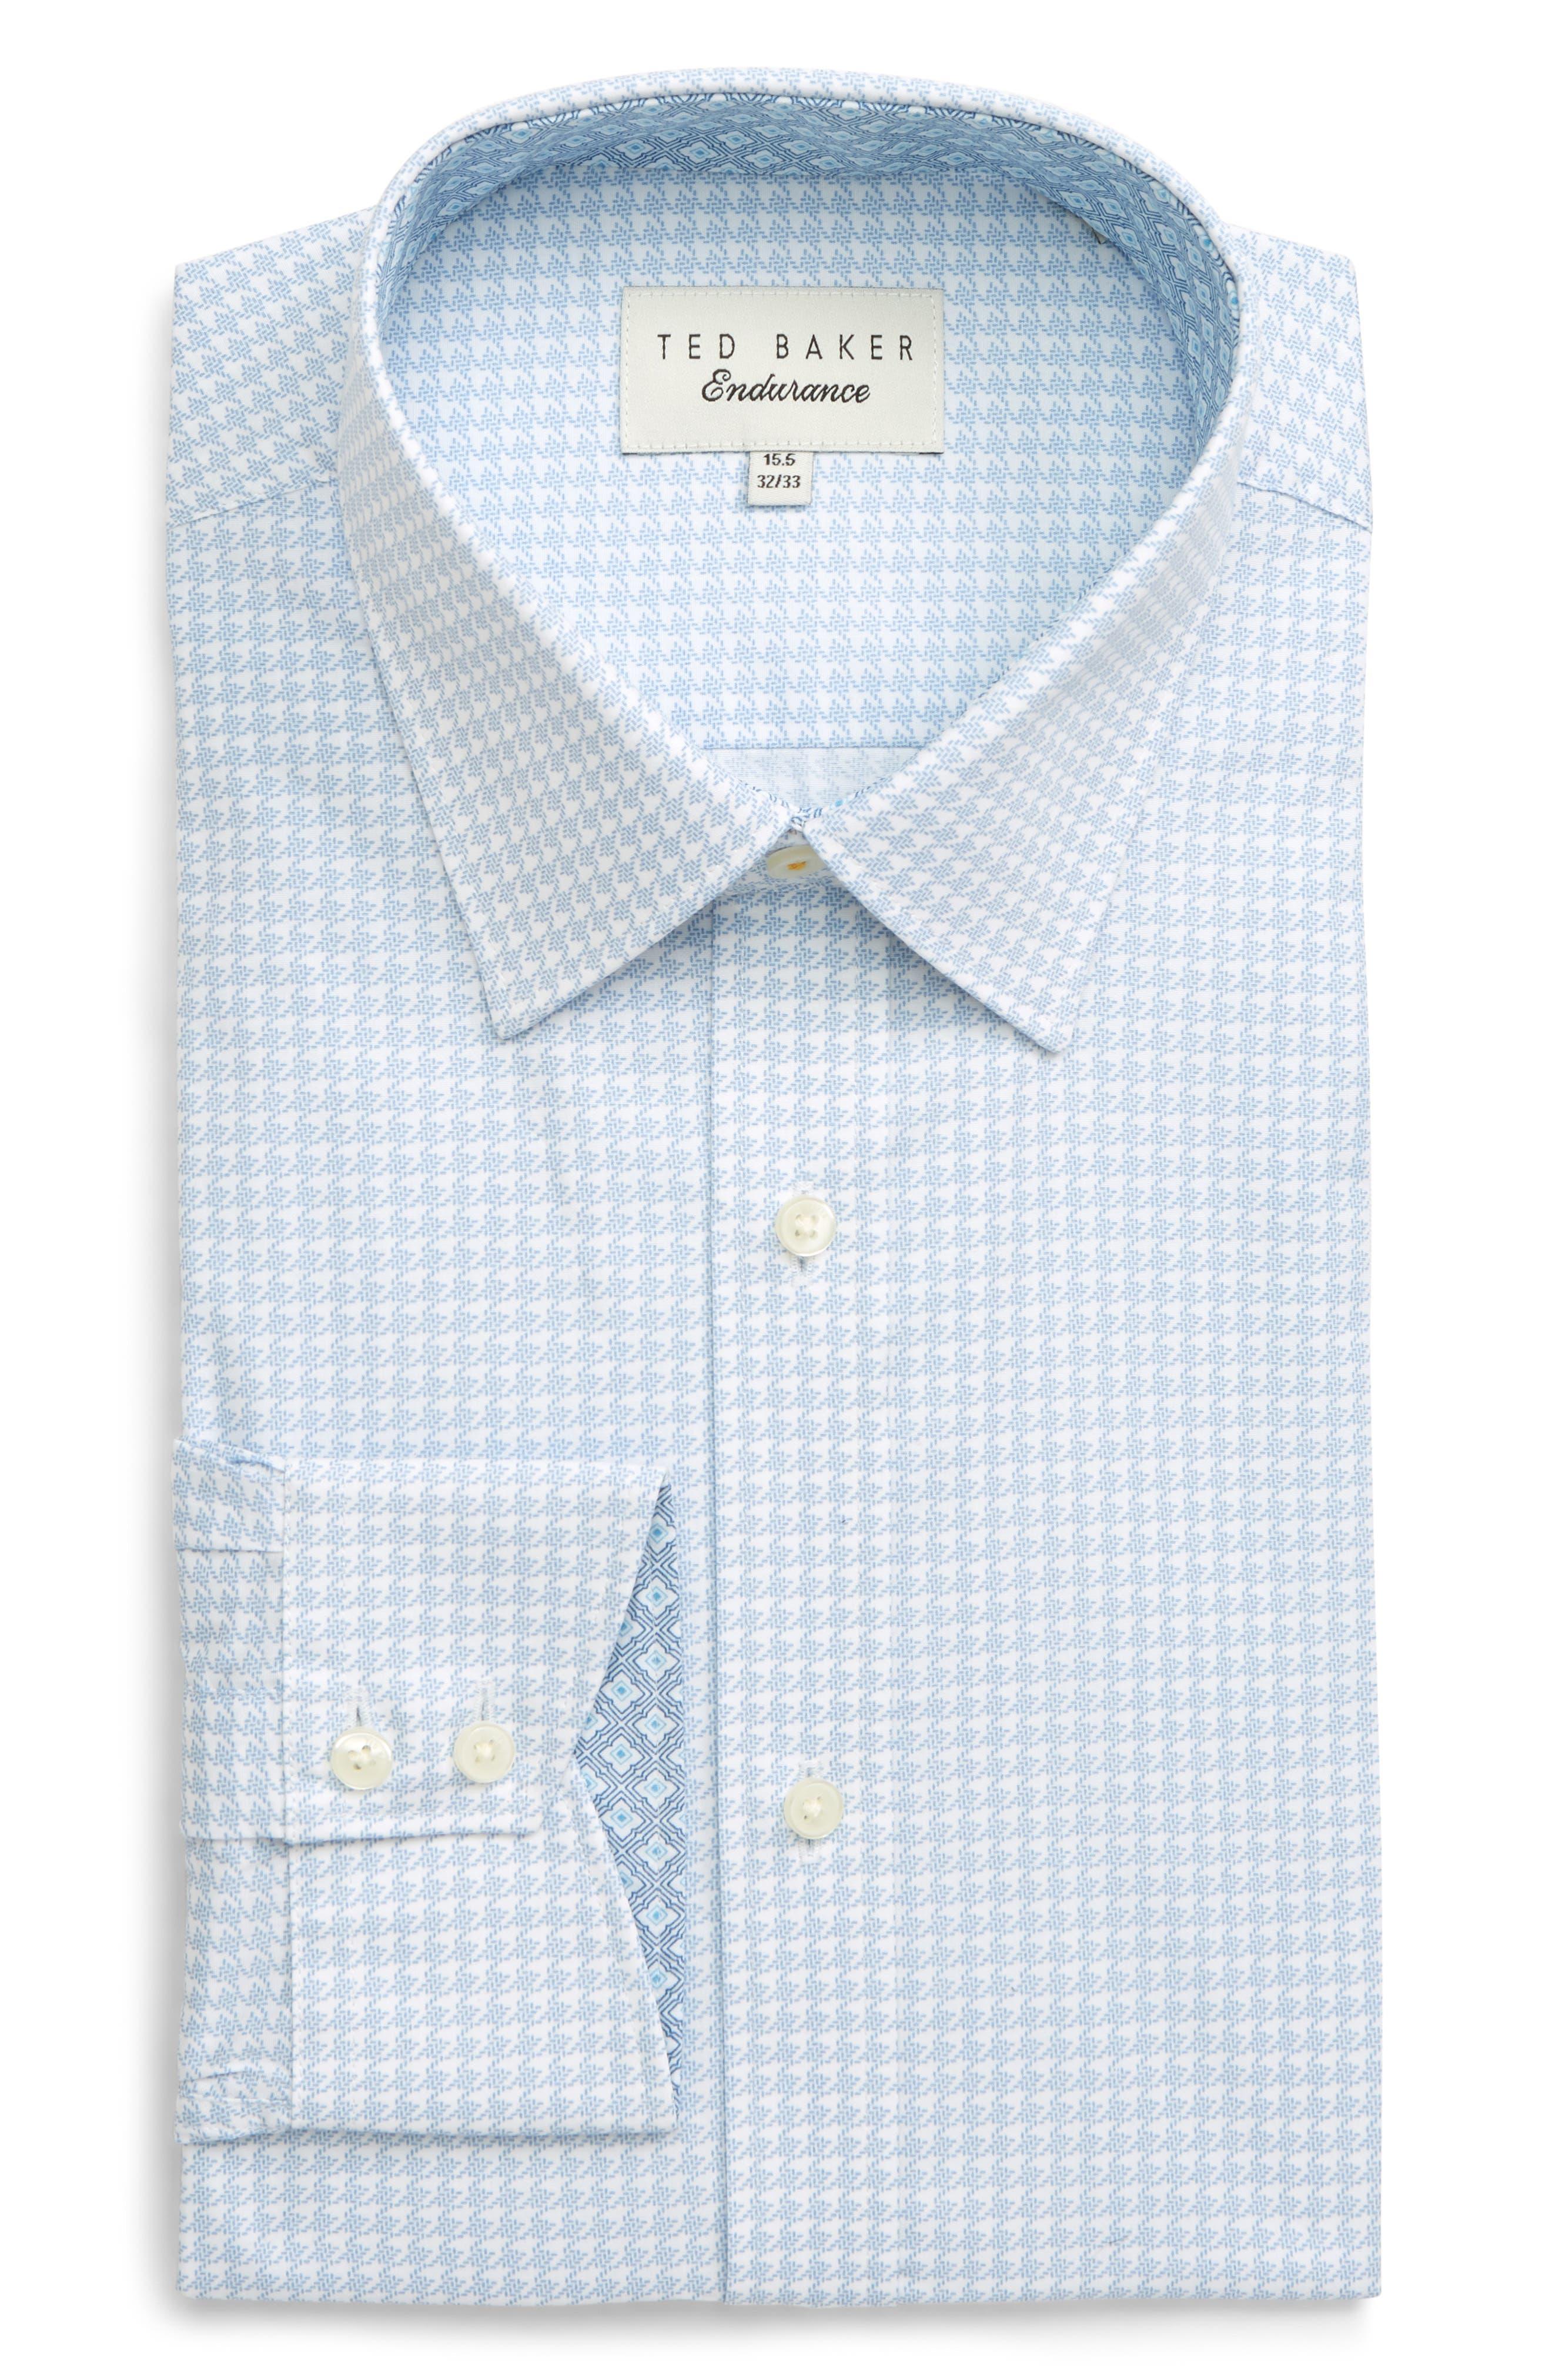 TED BAKER LONDON Endurance Grahite Slim Fit Houndstooth Dress Shirt, Main, color, BLUE